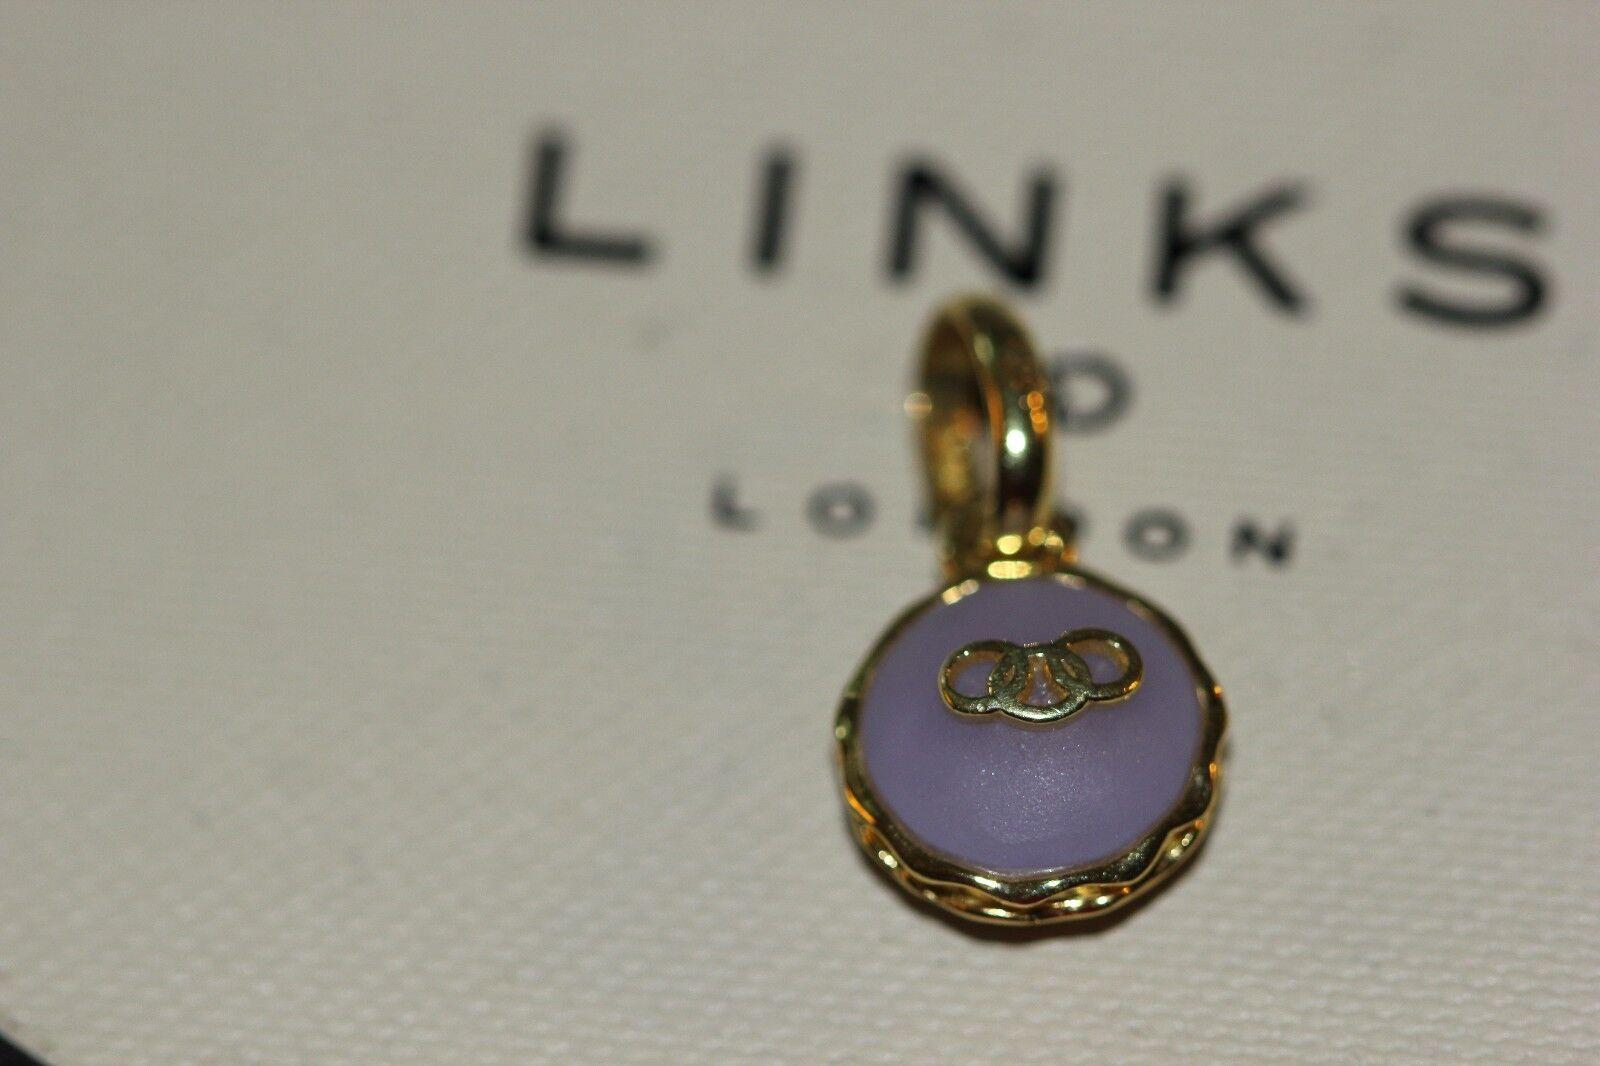 Genuine Links of London Lavender Macaron charm - 5030.2400